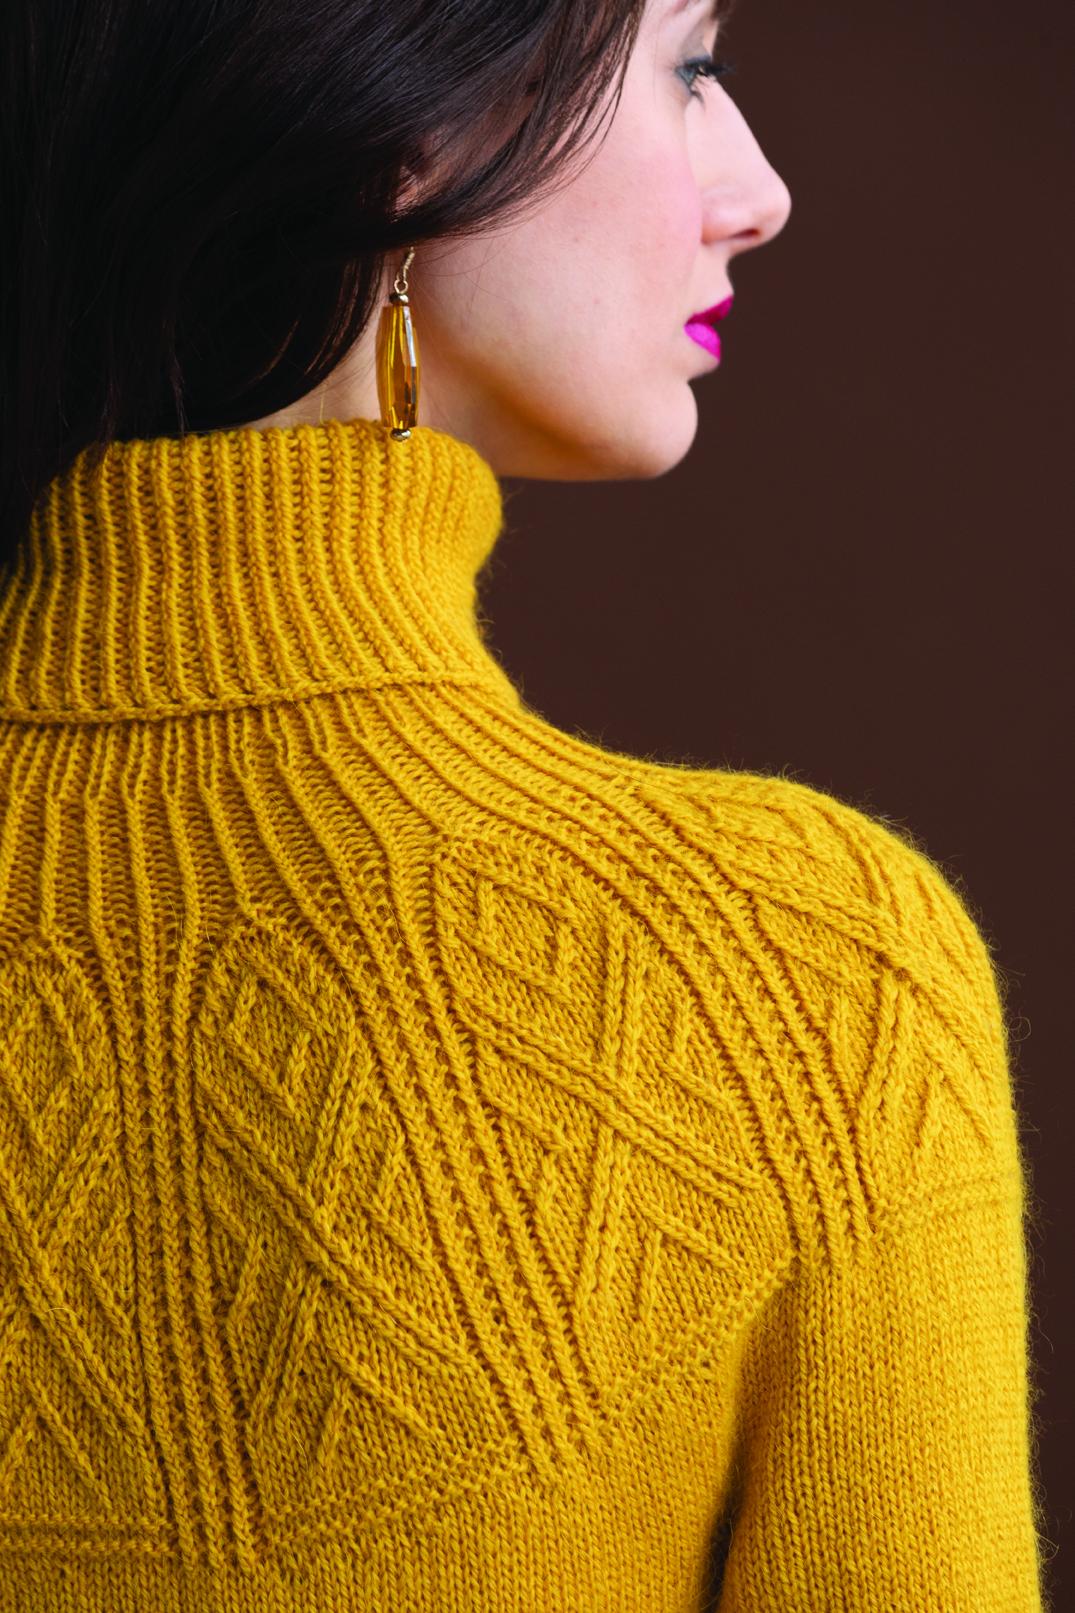 Yoked Pullover Vogue Knitting Early Fall, Norah Gaughan